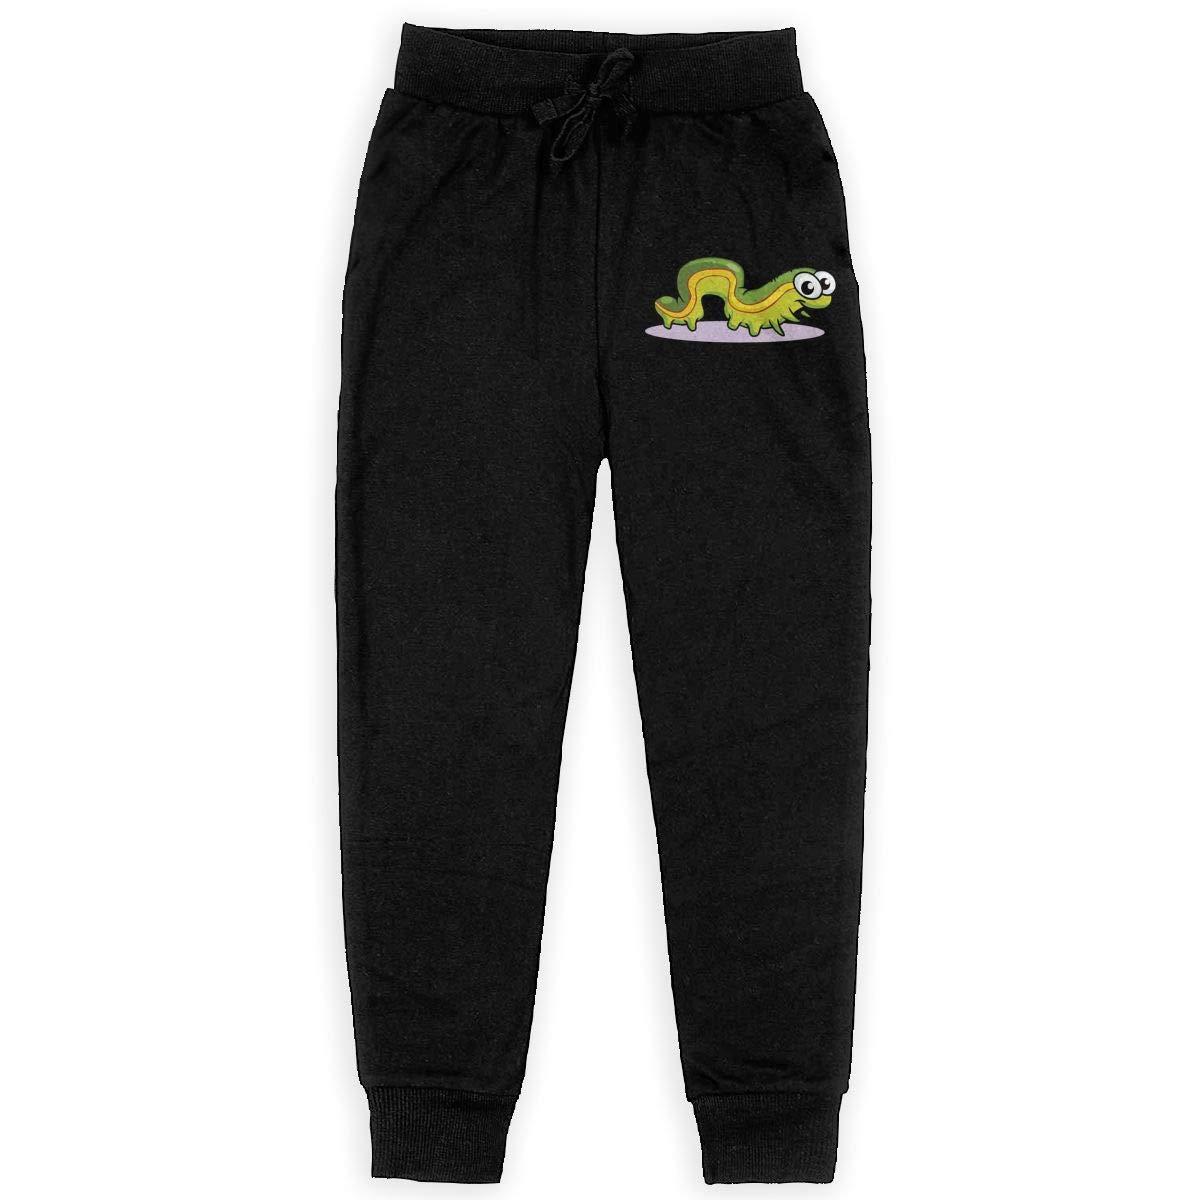 Boys Sweatpants Caterpillar Joggers Sport Training Pants Trousers Cotton Sweatpants for Youth